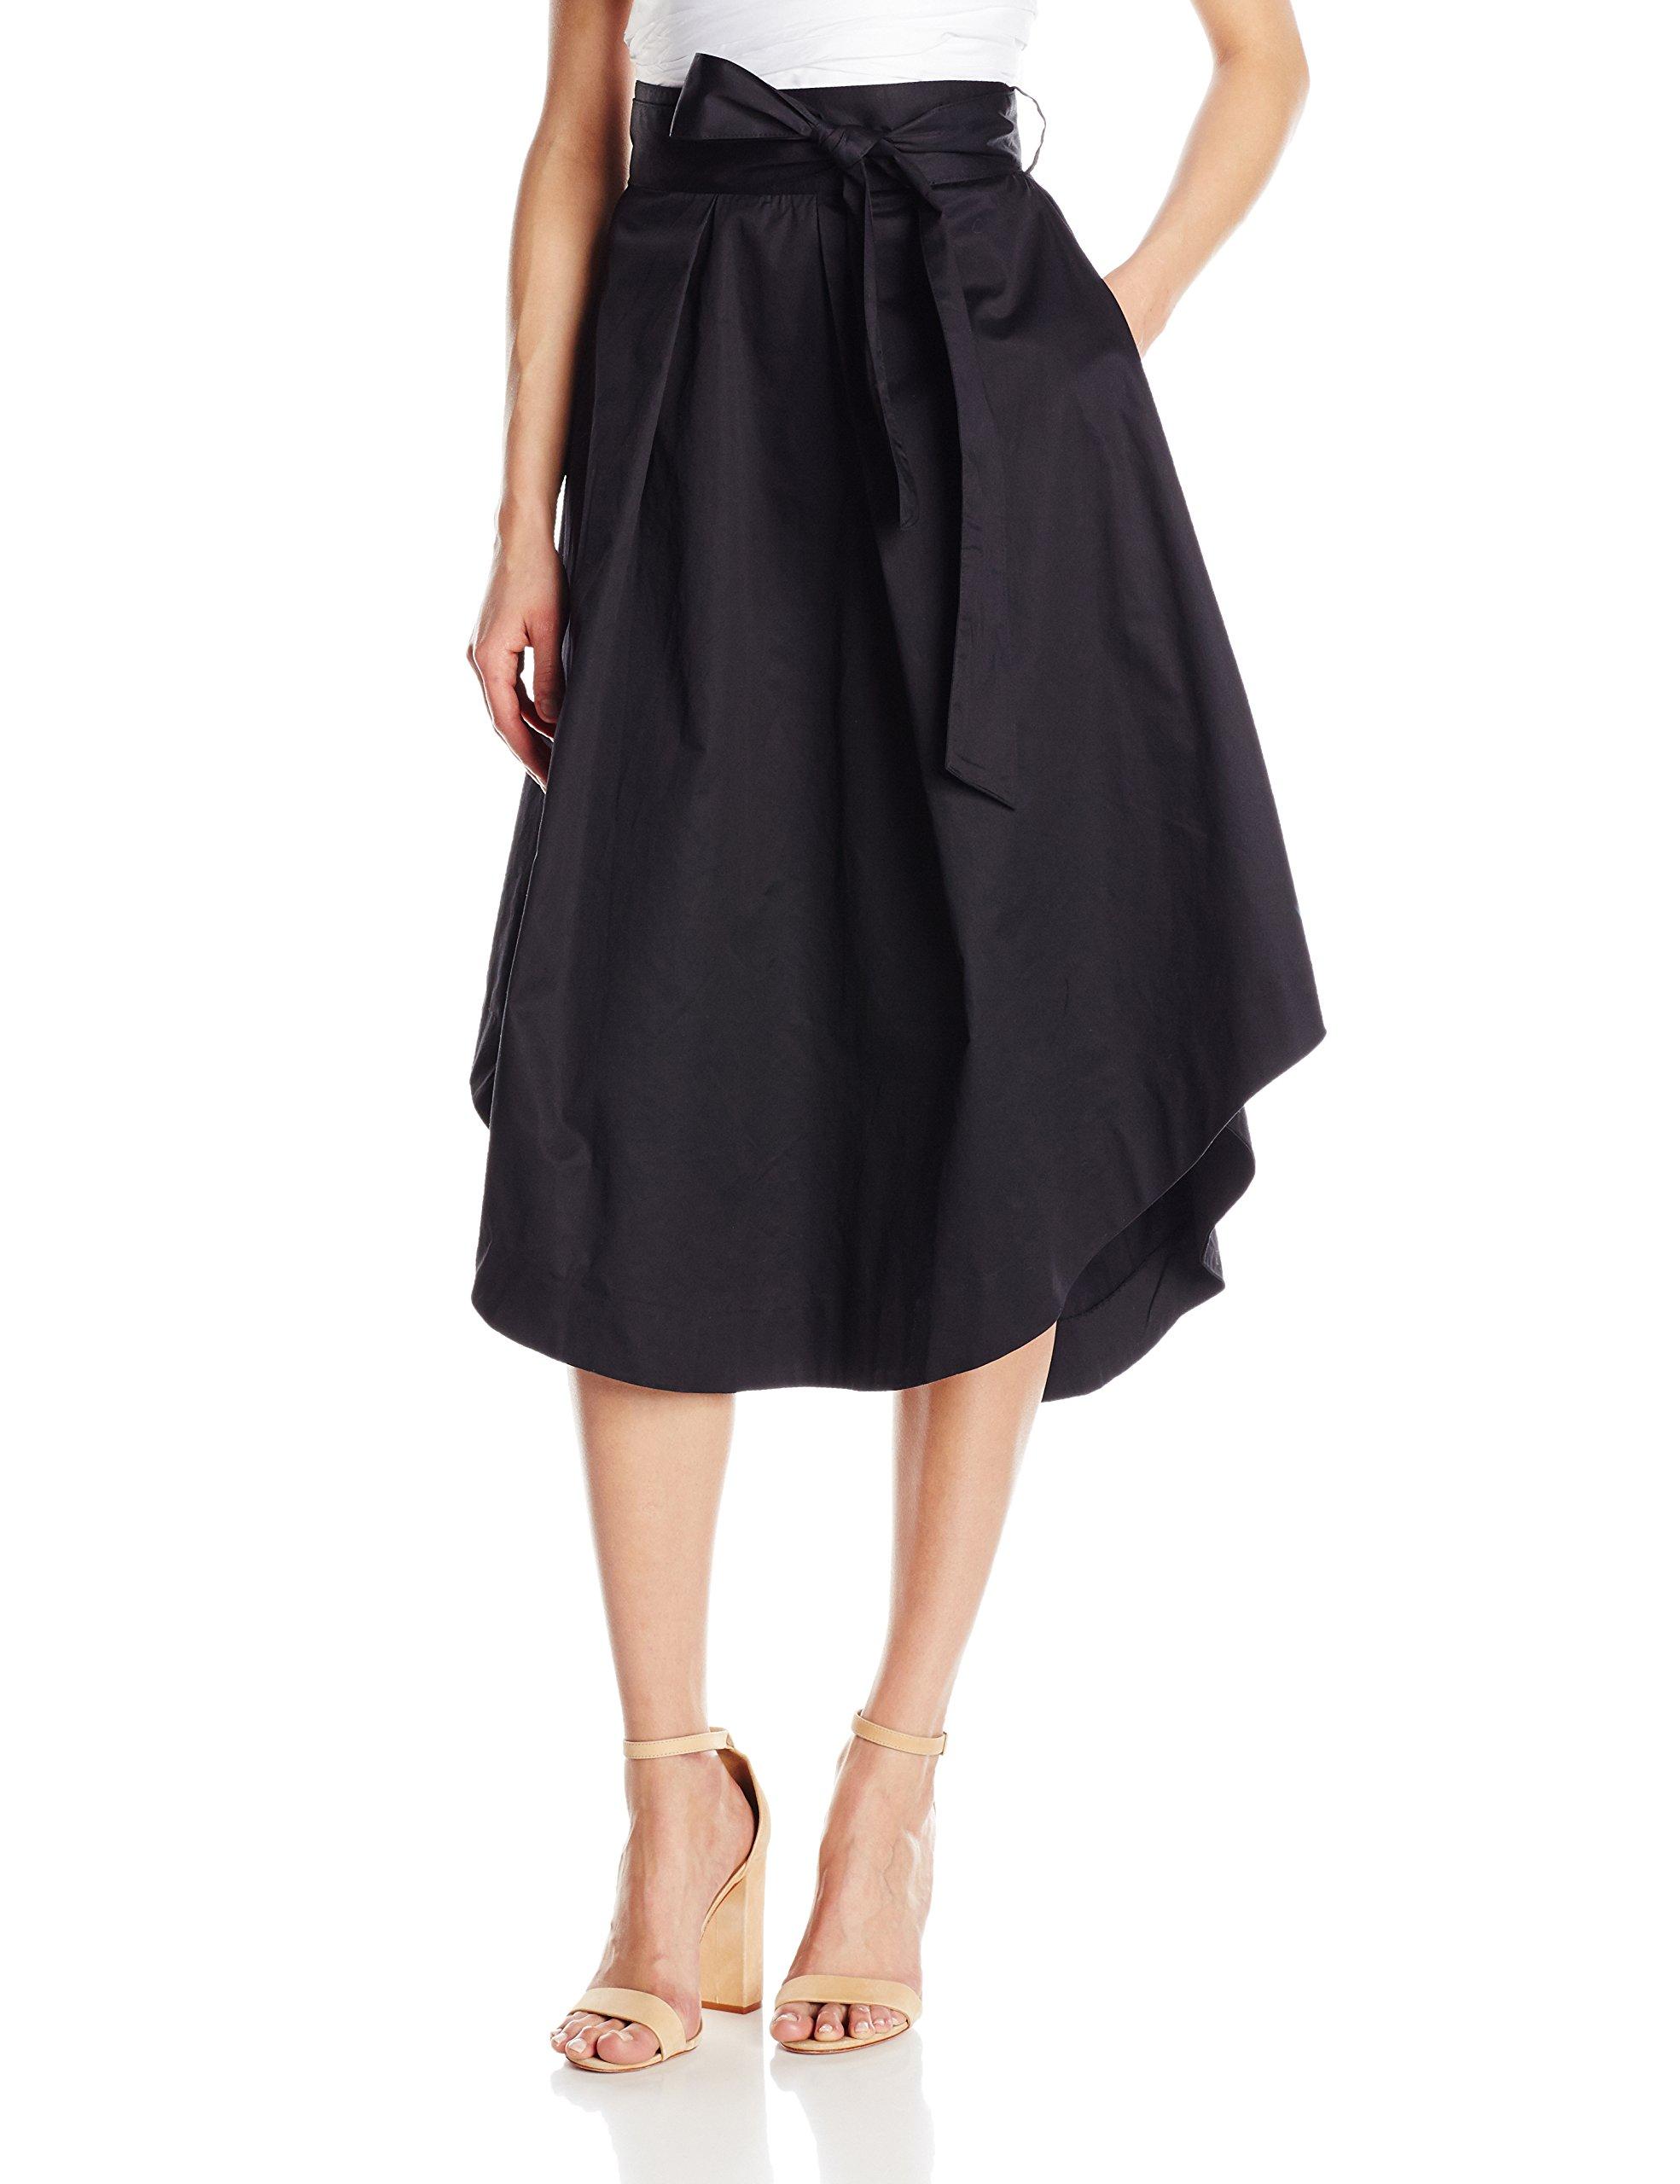 KENDALL + KYLIE Women's a-Line Swing Skirt, Black, L